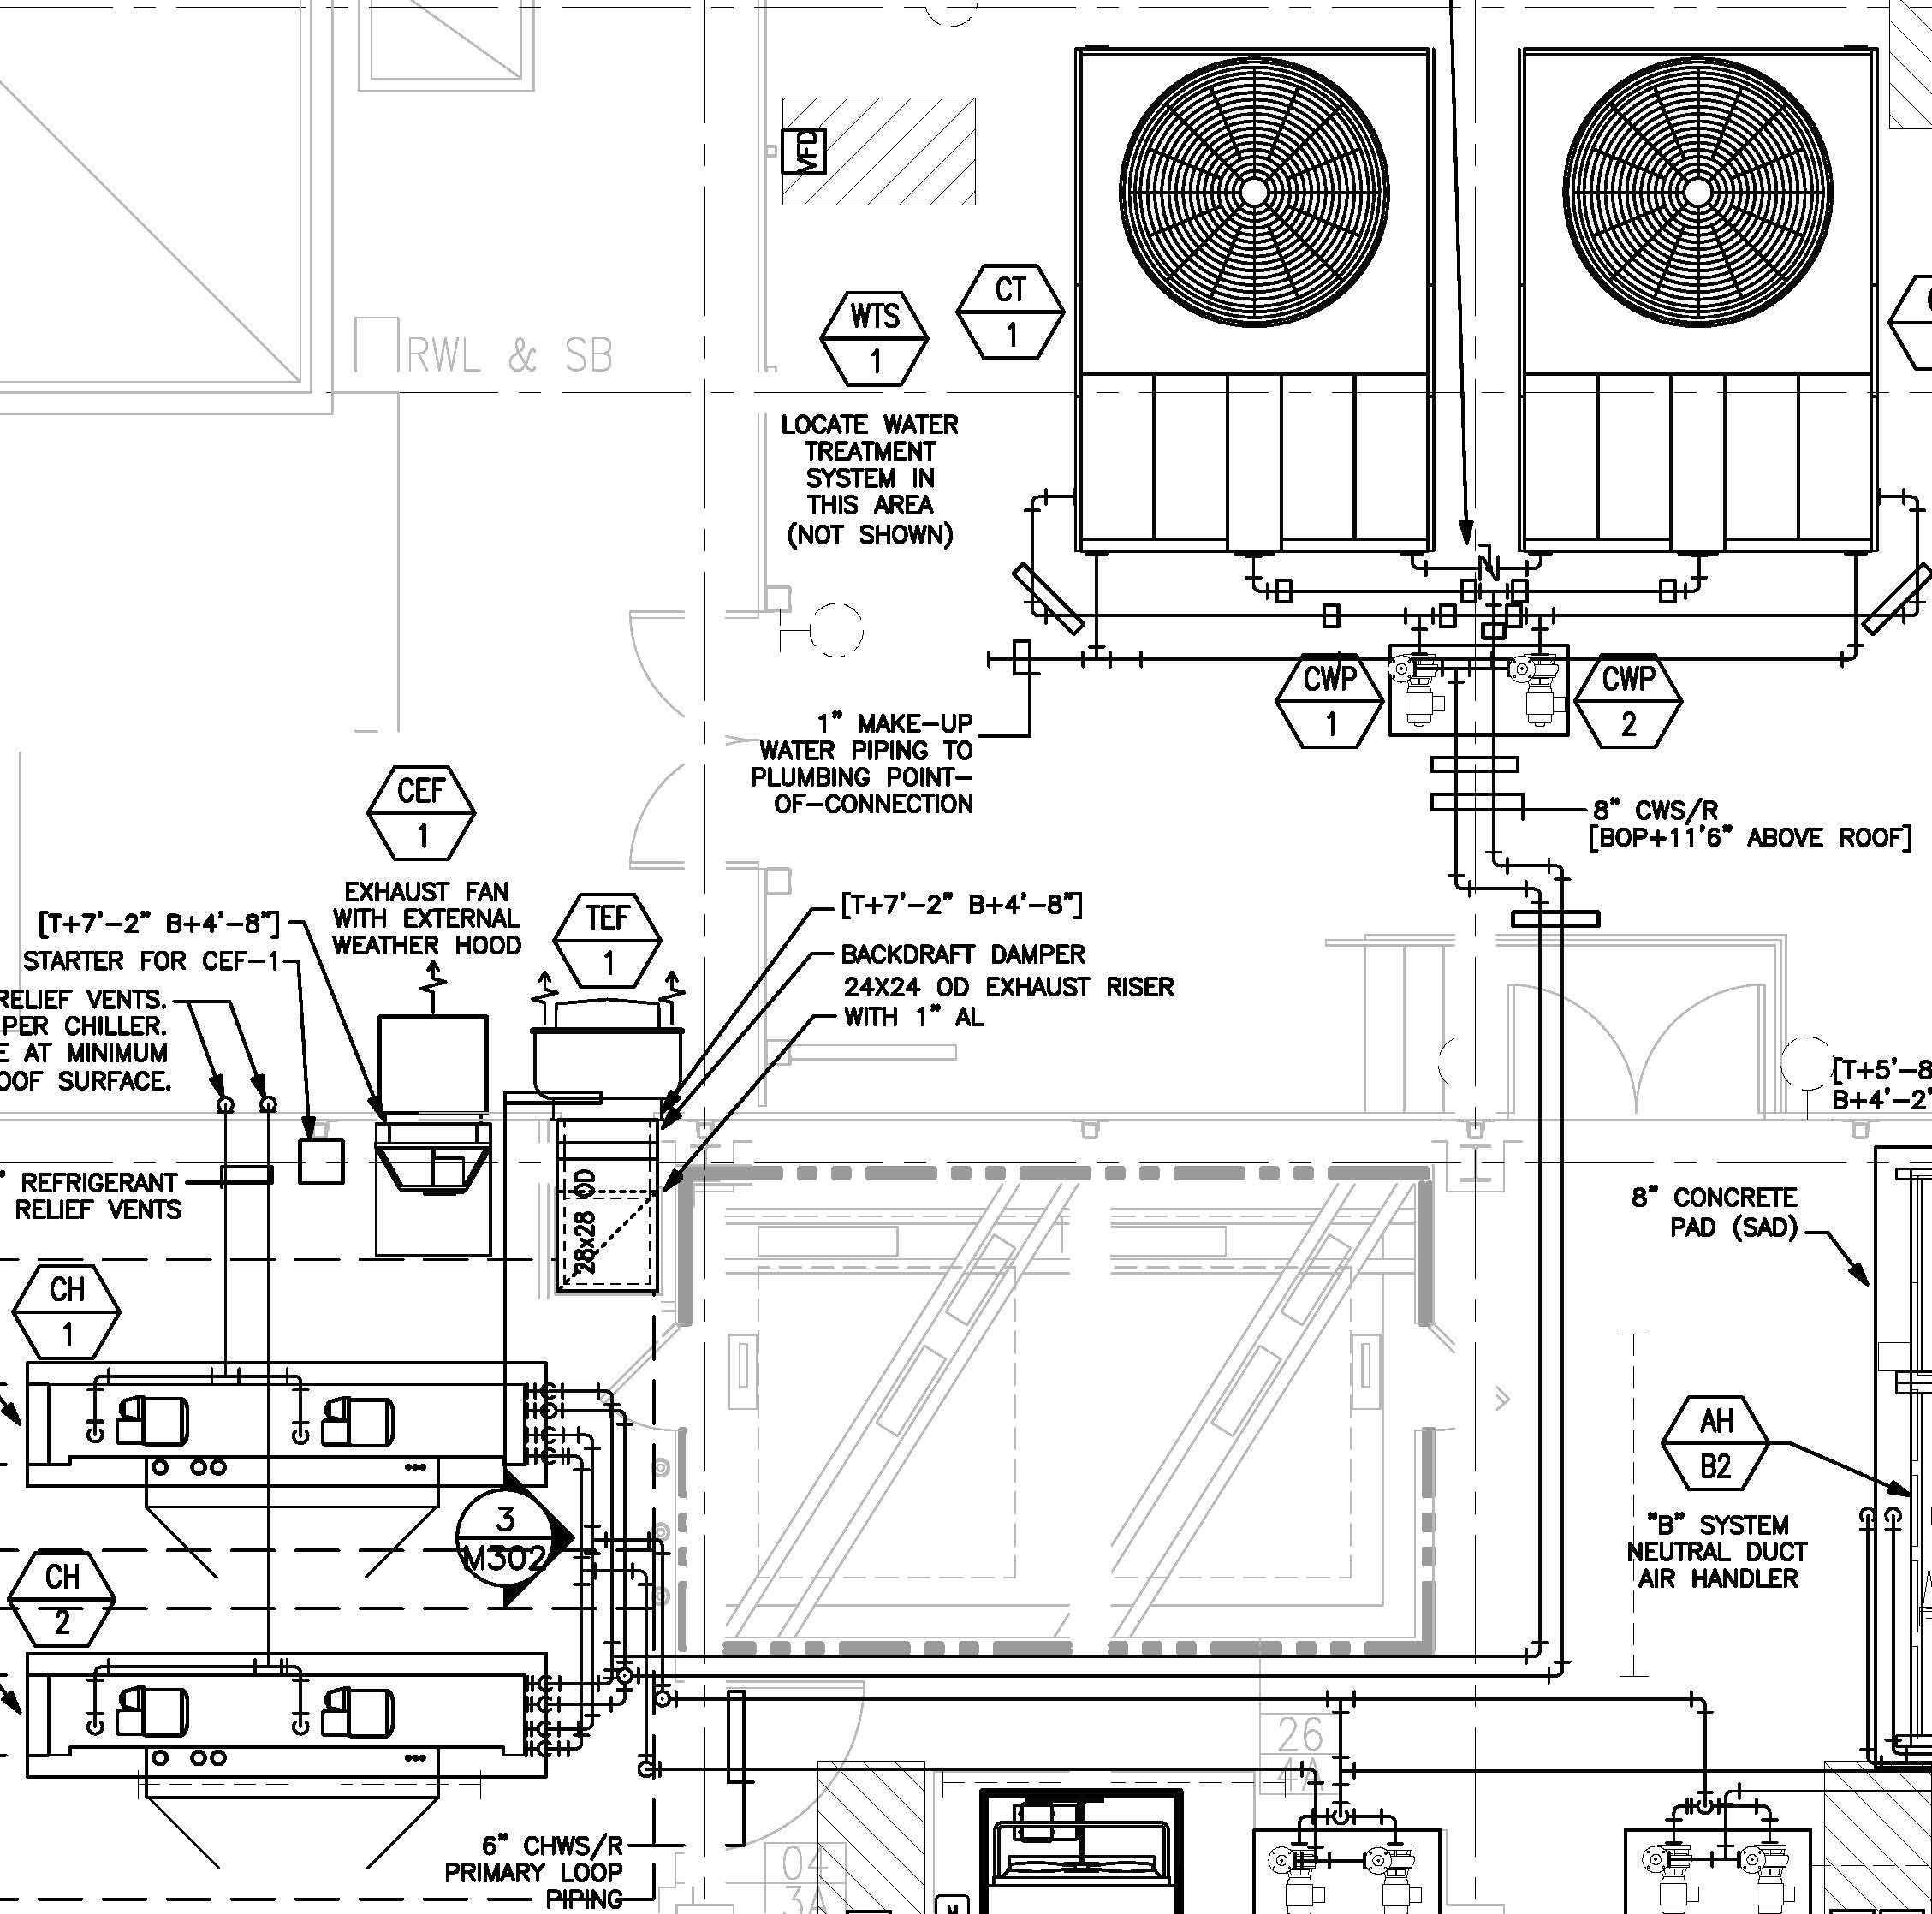 2007 Sterling Truck Wiring Diagram Sterling Makeup Air Wiring Diagram Of 2007 Sterling Truck Wiring Diagram